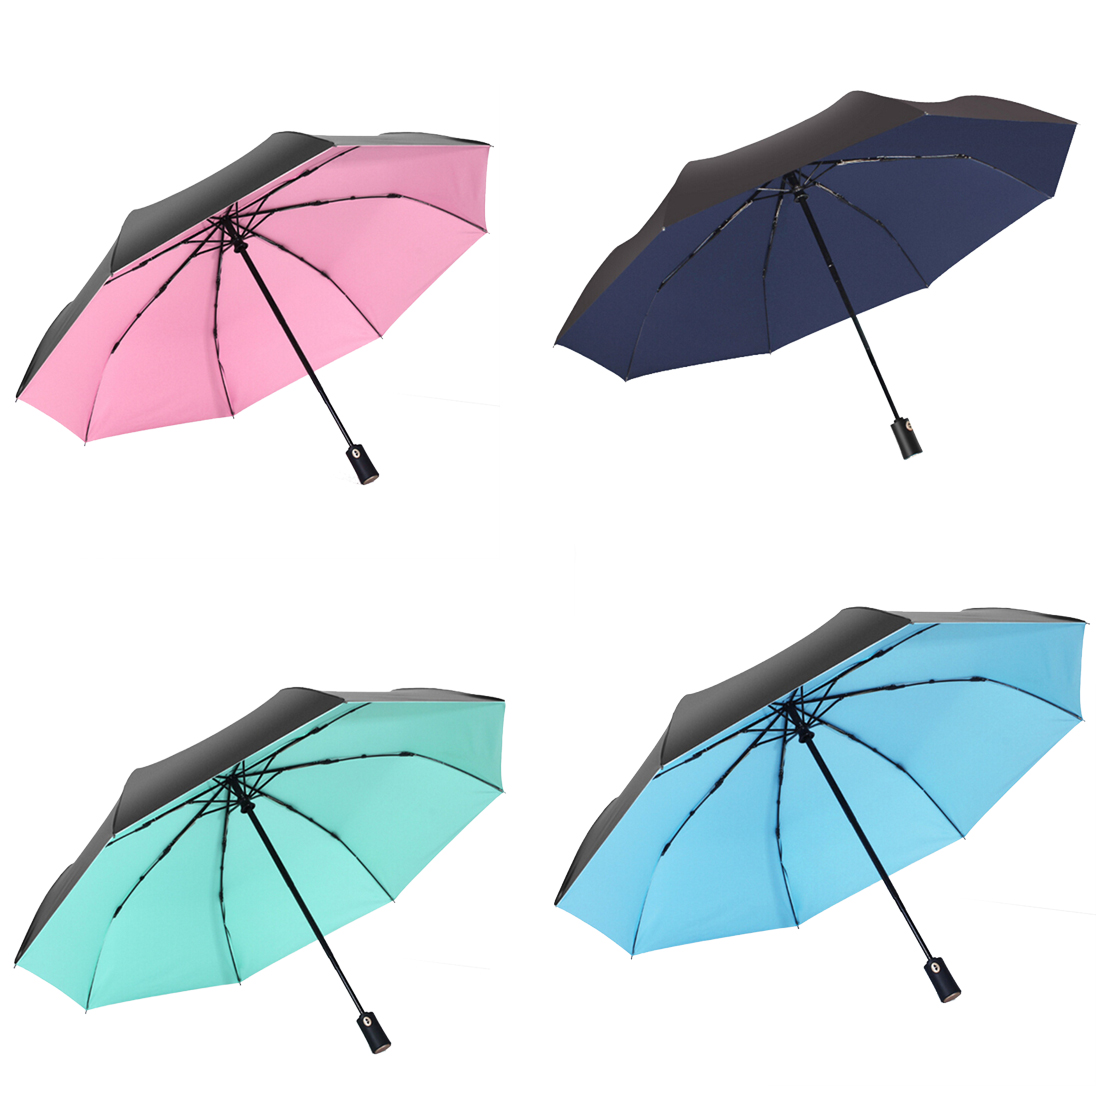 sun protection UV protection umbrella Automatic umbrella 24 inch increase mens umbrella